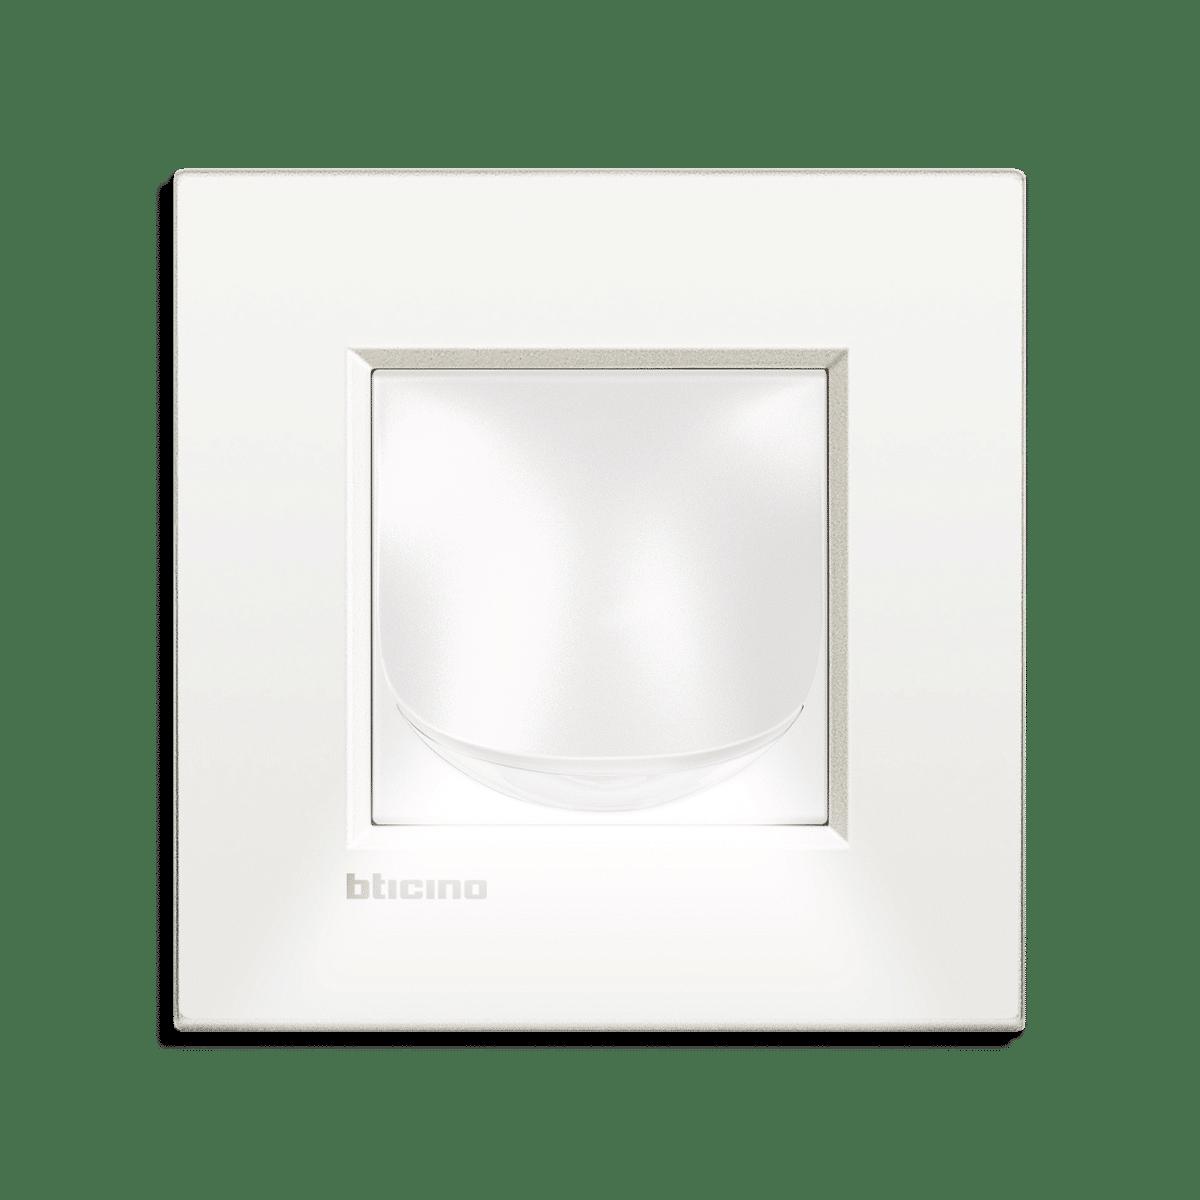 LAMPADE DIMMERABILI, DIREZIONALI E ORIENTABILI